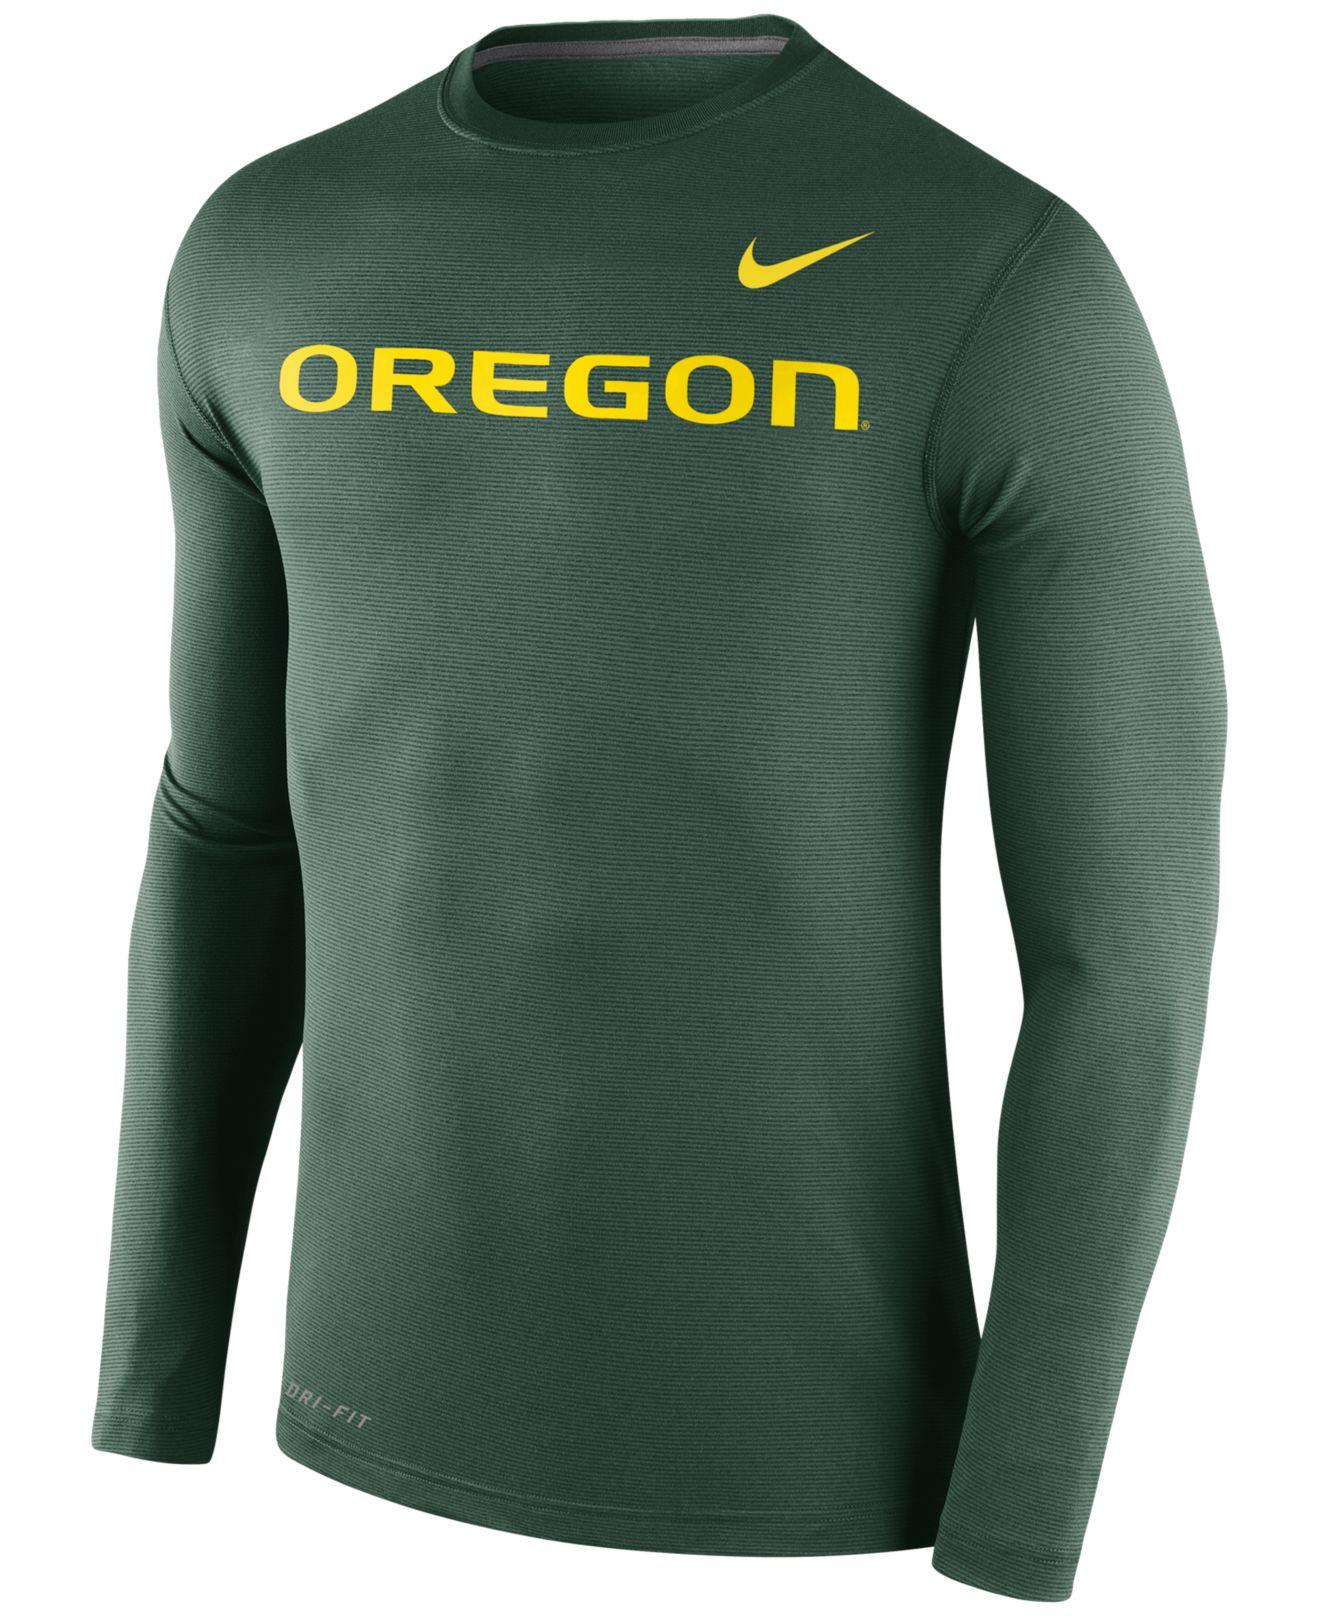 Lyst - Nike Men's Long-sleeve Oregon Ducks Stadium Dri-fit ...